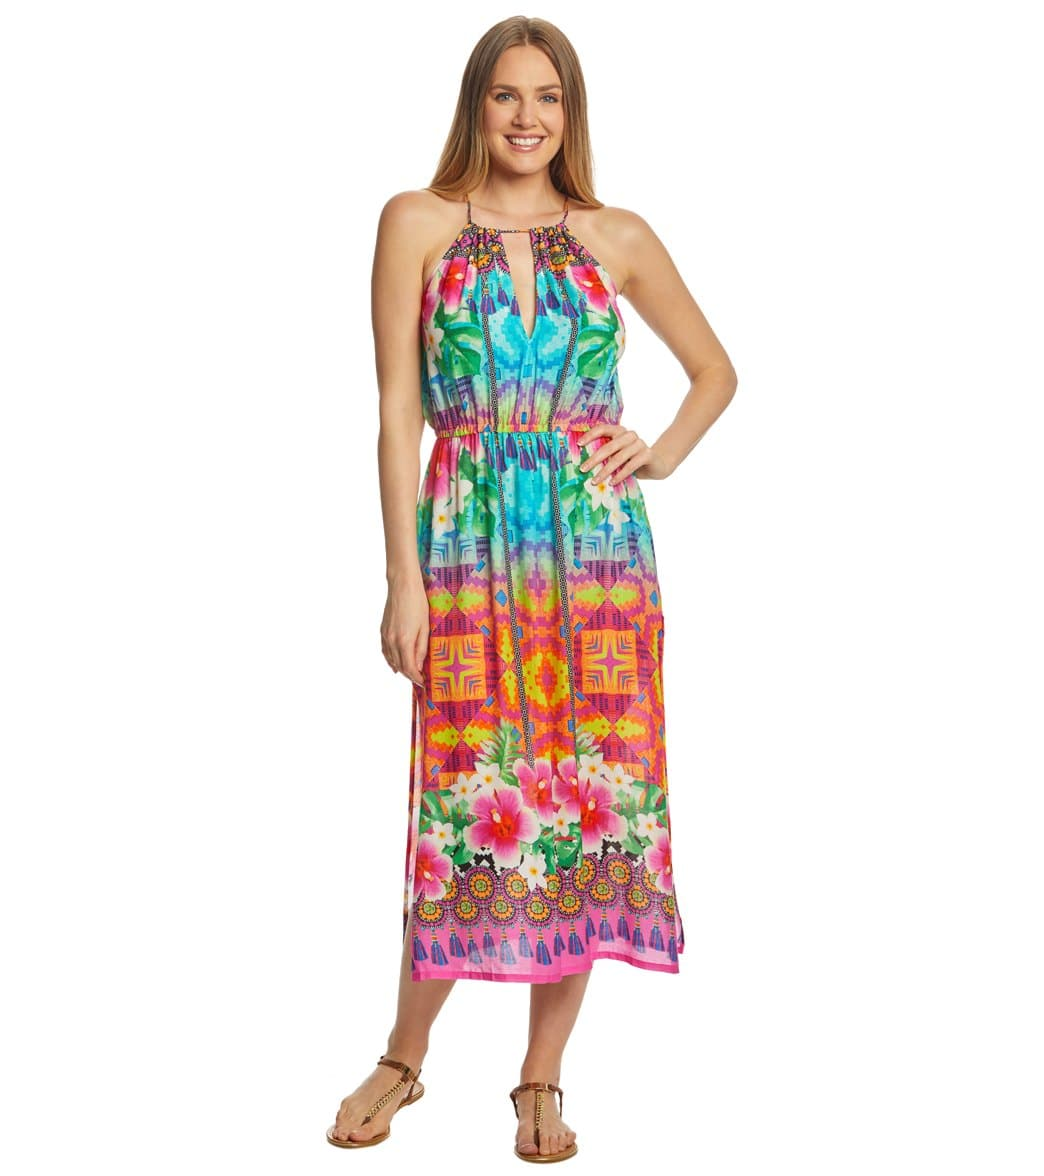 588a107aee9a Nanette Lepore Playa Nayarit Midi Dress at SwimOutlet.com - Free Shipping